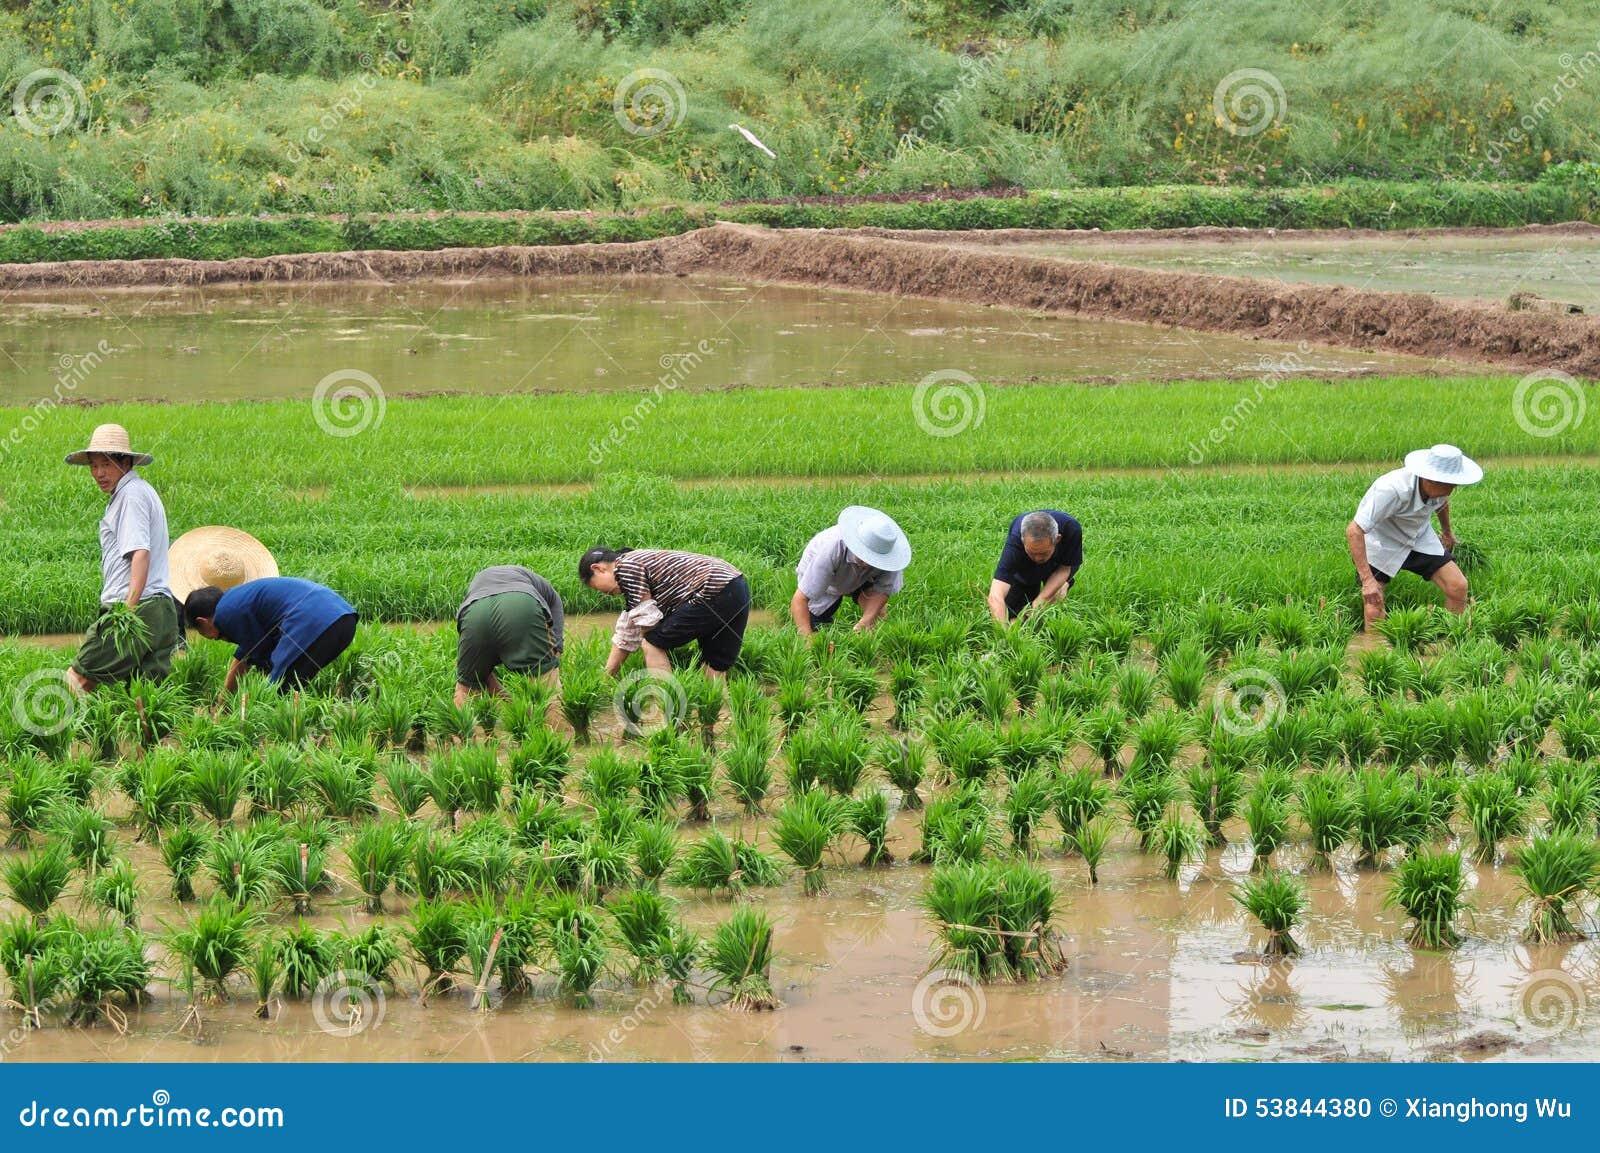 Chinese transplant rice seedlings